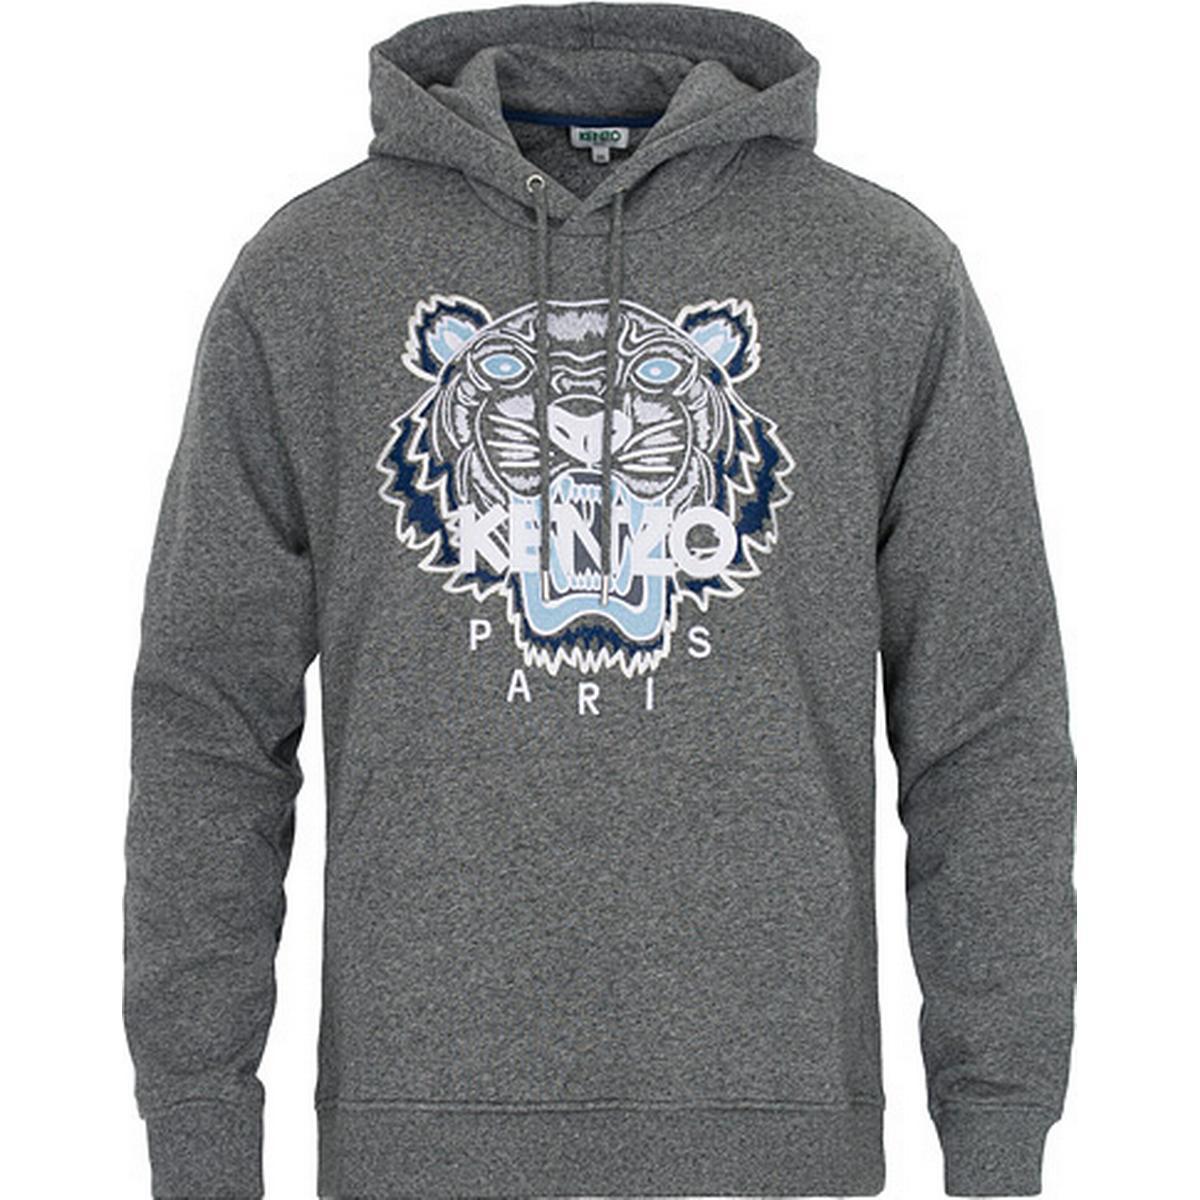 MULTICOLOUR Hooded patterned sweatshirt  Dsquared2  Hood tröjor